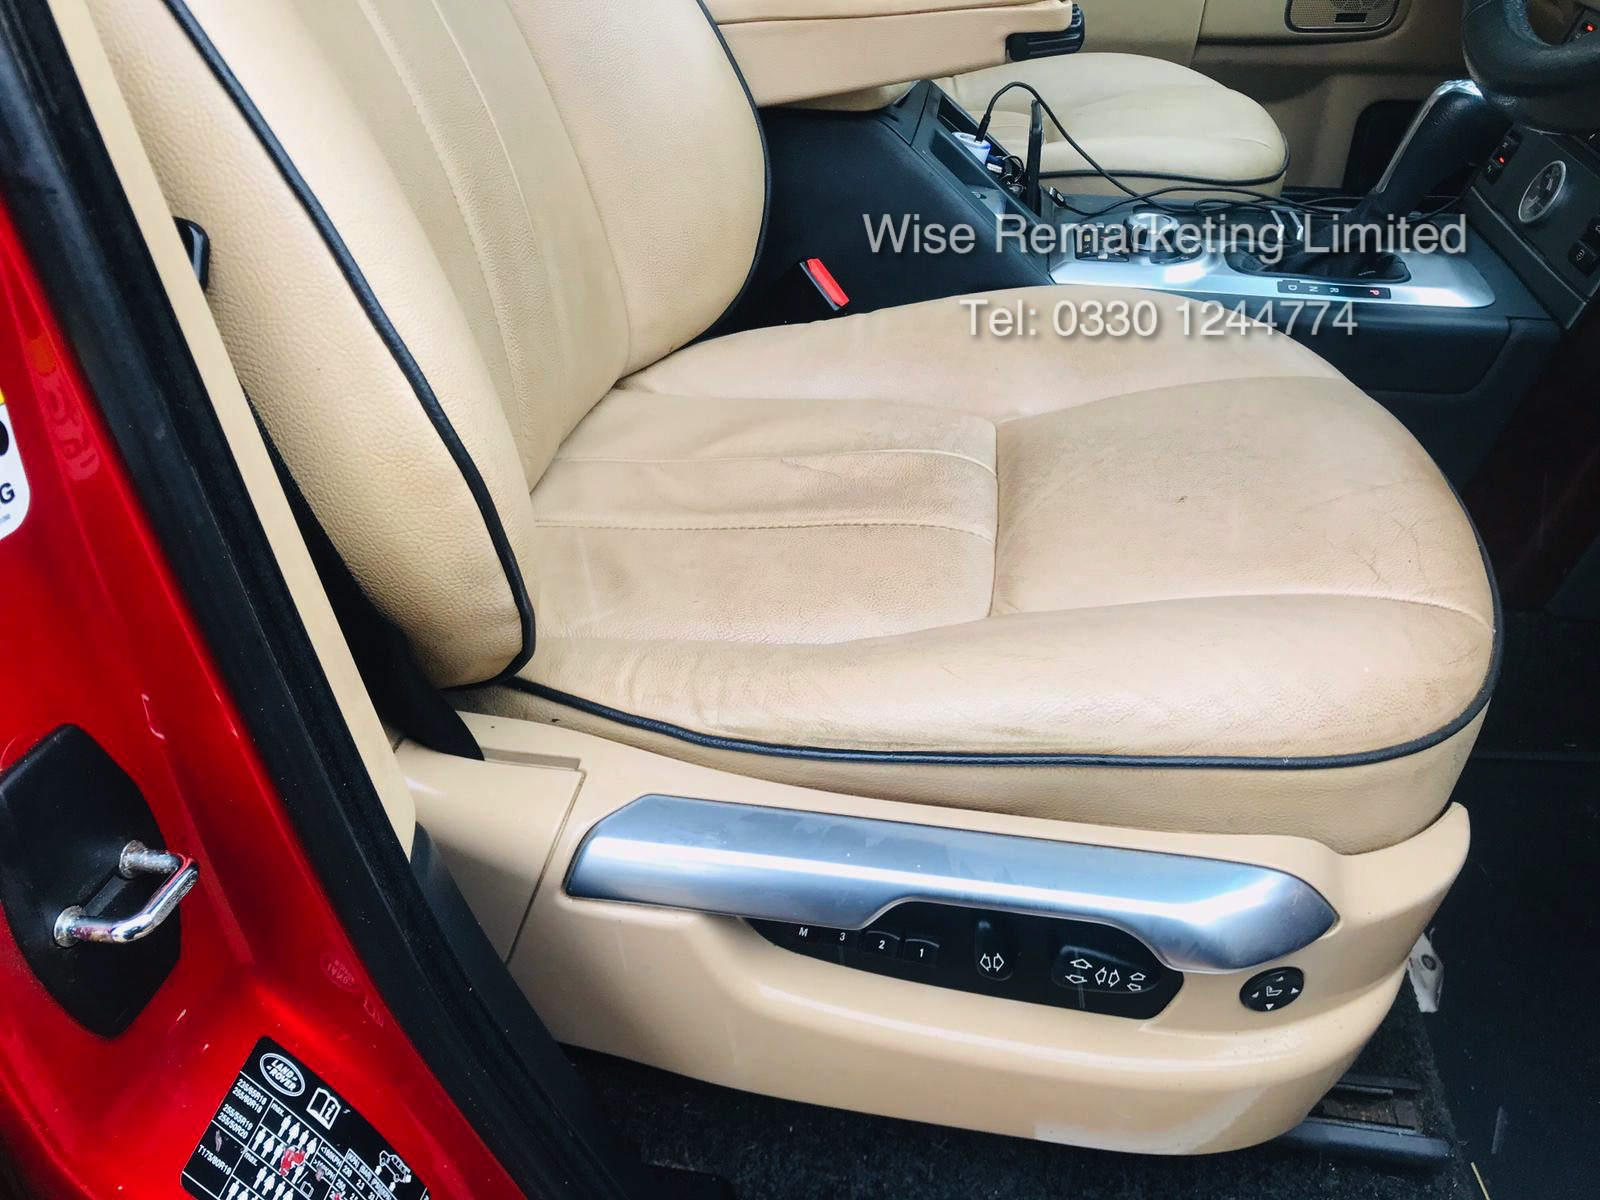 Range Rover Vogue 3.6 TDV8 HSE Auto - 2010 Model - Cream Leather - Service History - - Image 15 of 28